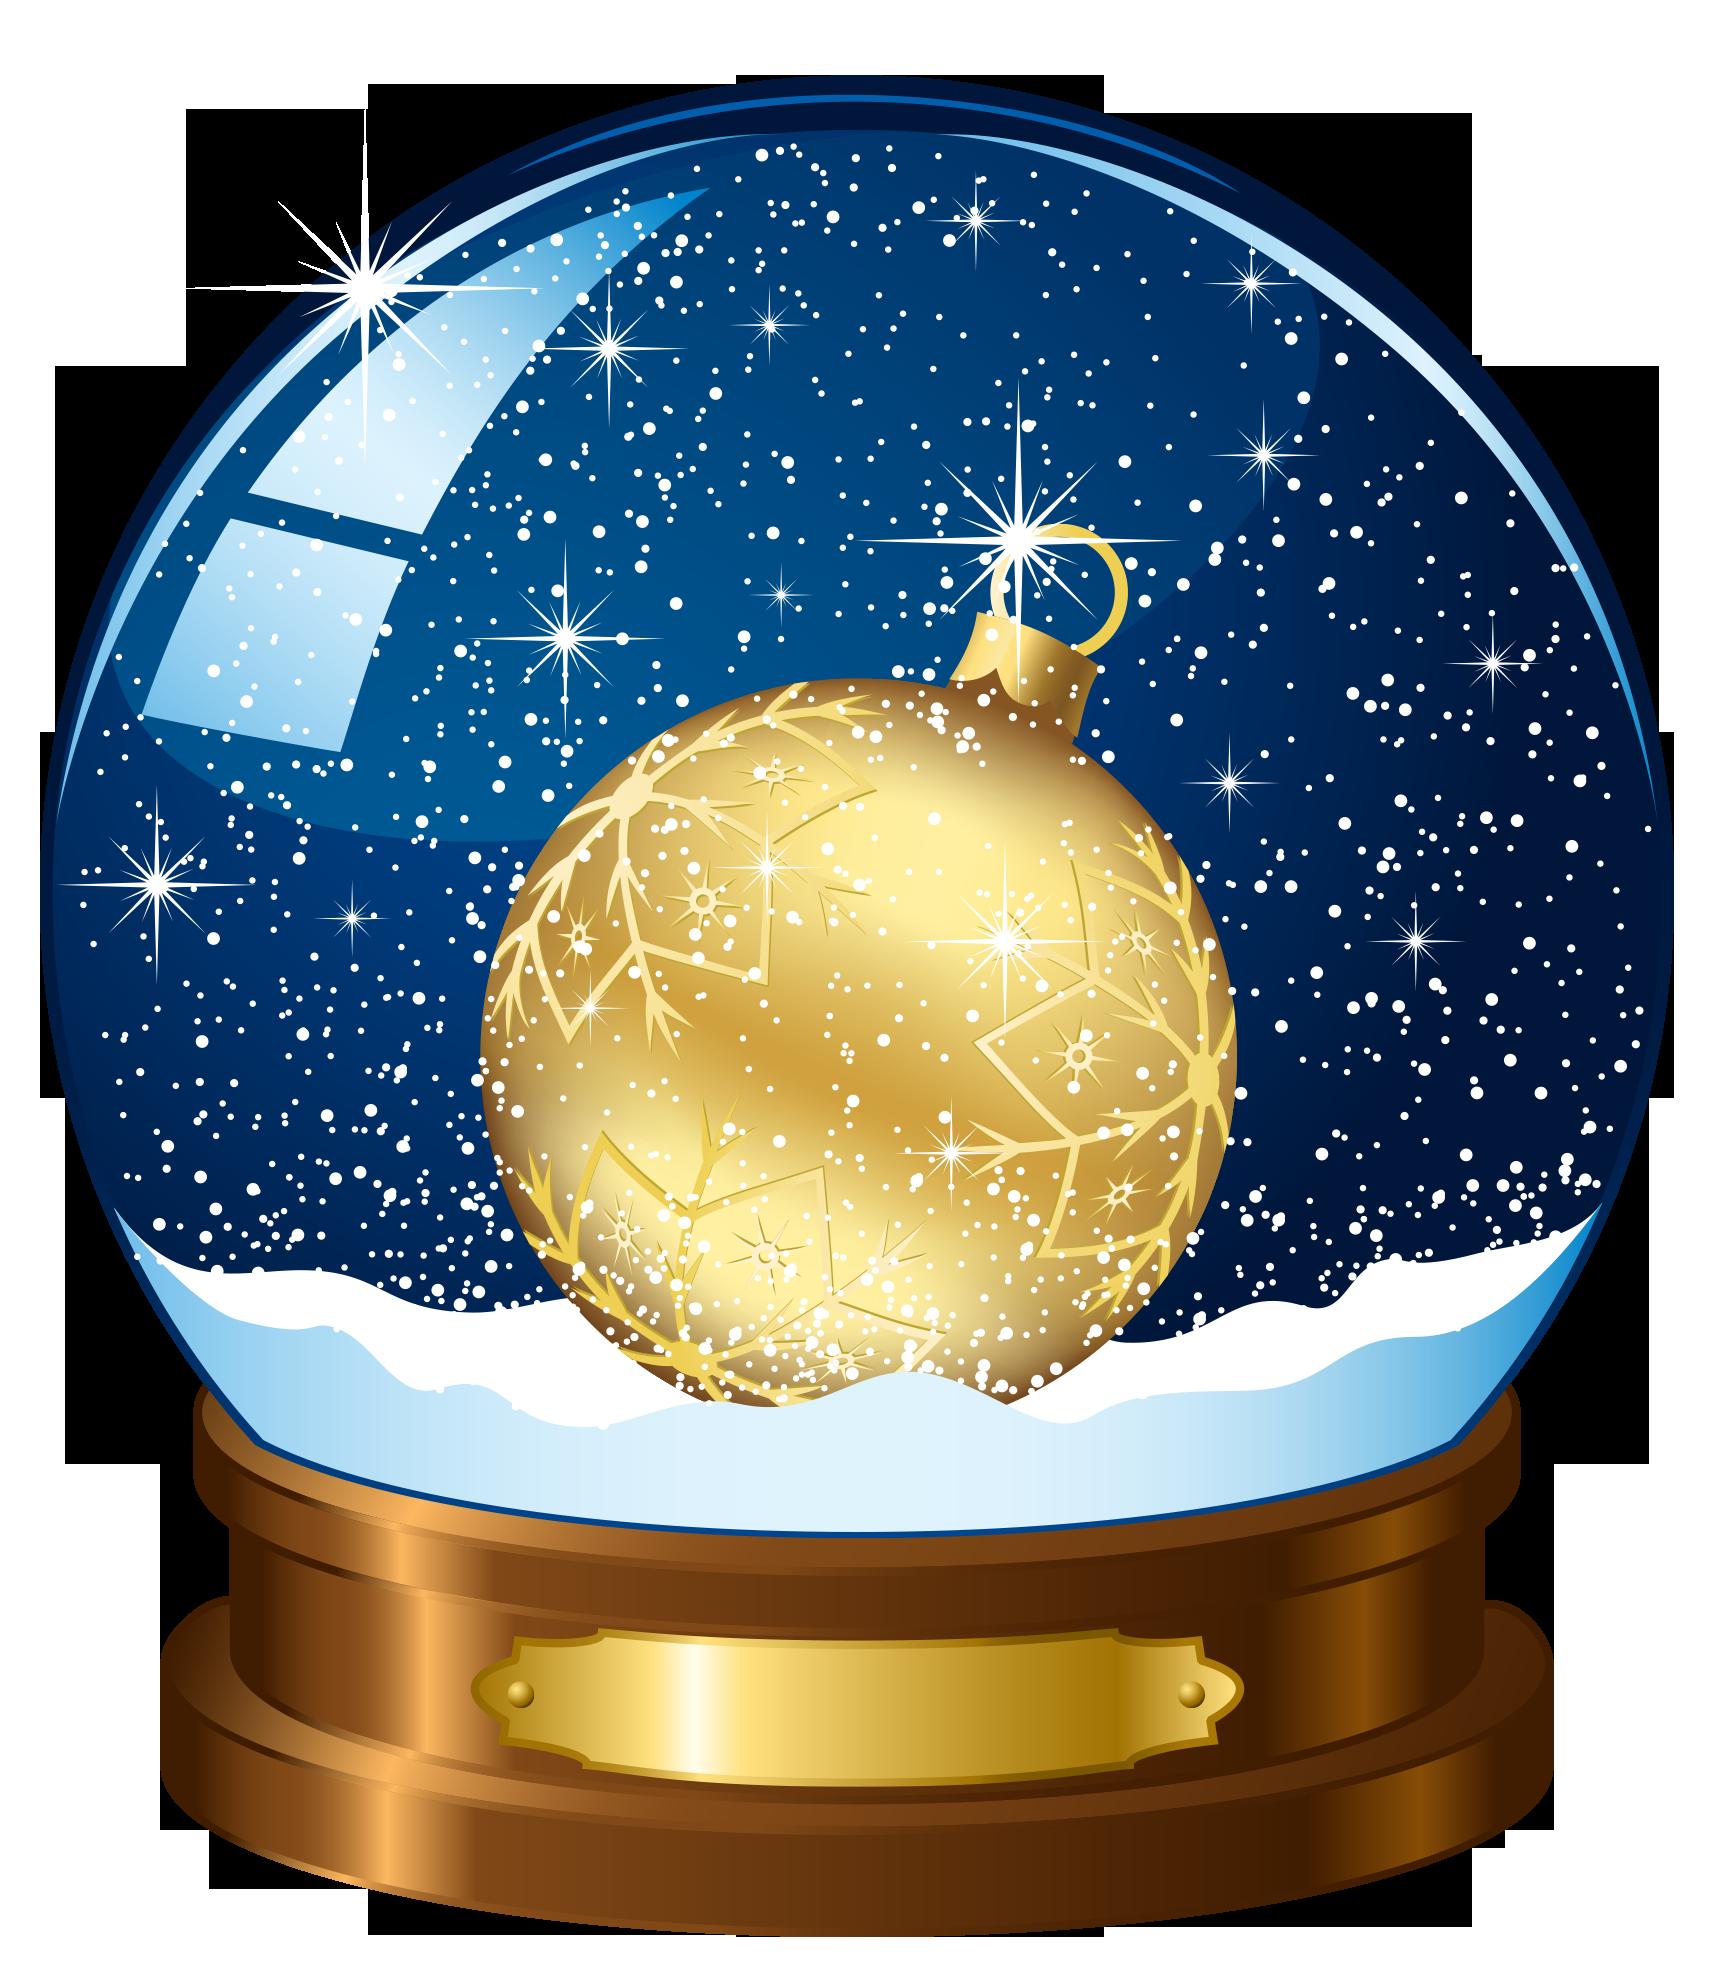 Snowflake globe clipart clipart library stock Rudolph Christmas tree Snow globe Wallpaper - Free Christmas crystal ... clipart library stock